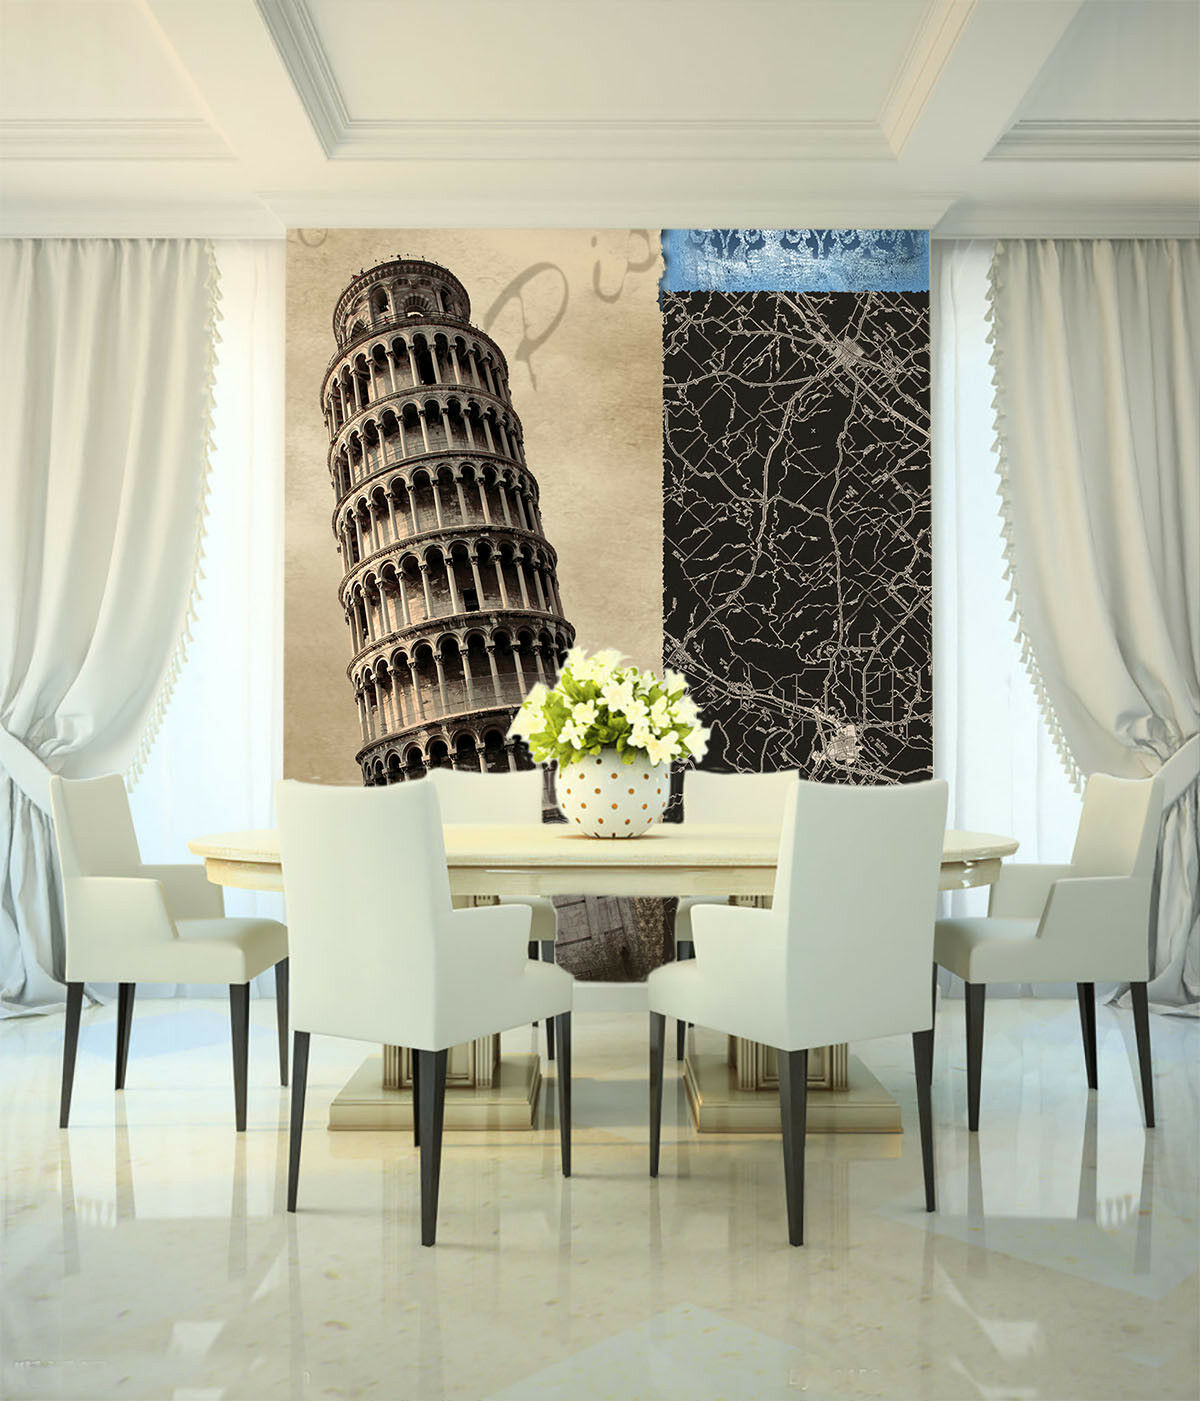 Papel Pintado Mural De Vellón Pisa Inclinada Torre 21 Paisaje Fondo De Pansize